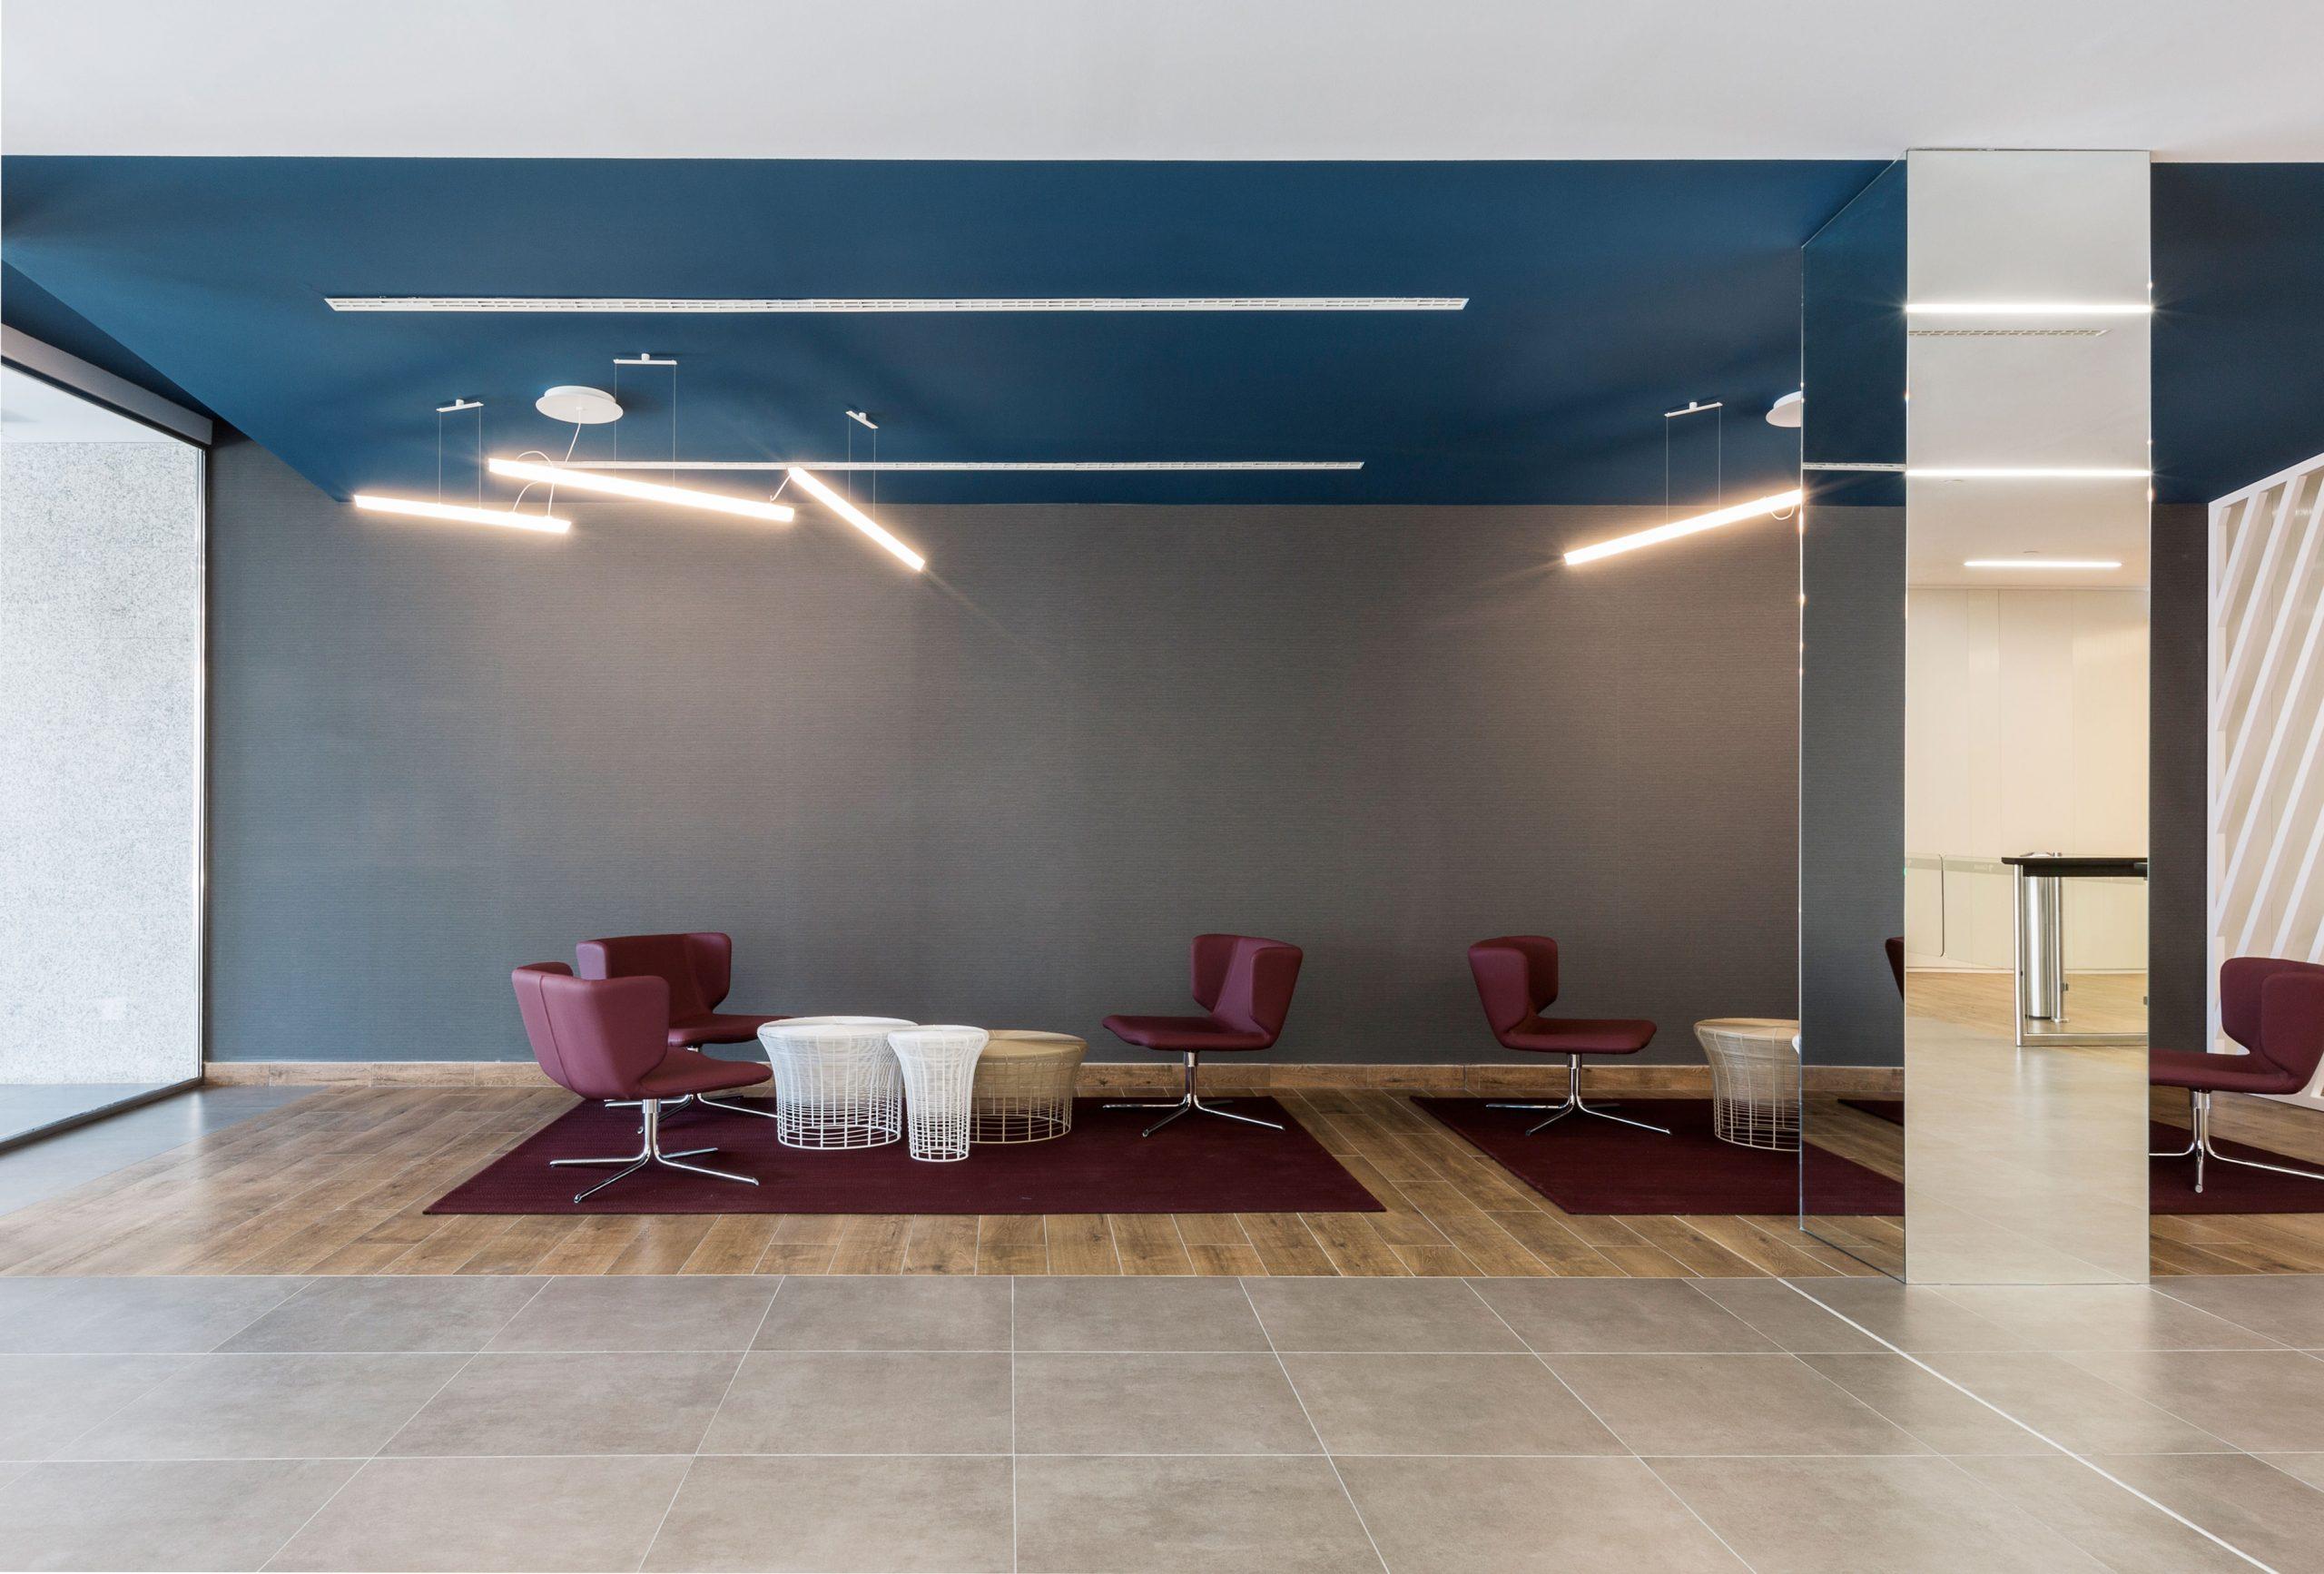 arquitectura_corporativa_zona_espera_oficinas_alfombras_interface_lamparas_vibia